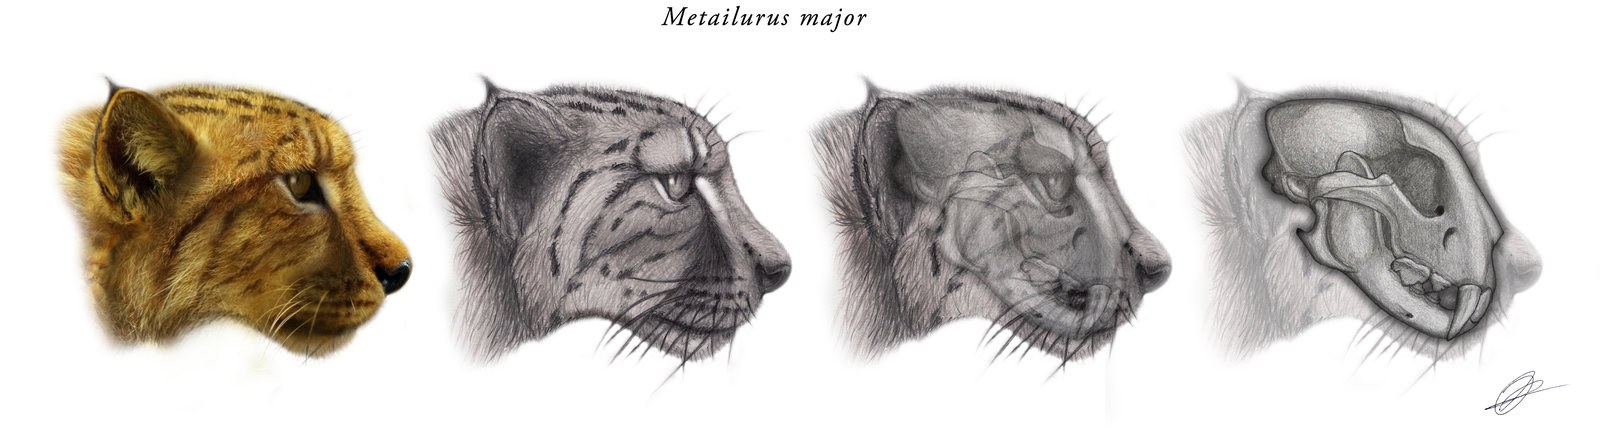 metailurus_major_hutzler_peter.jpg